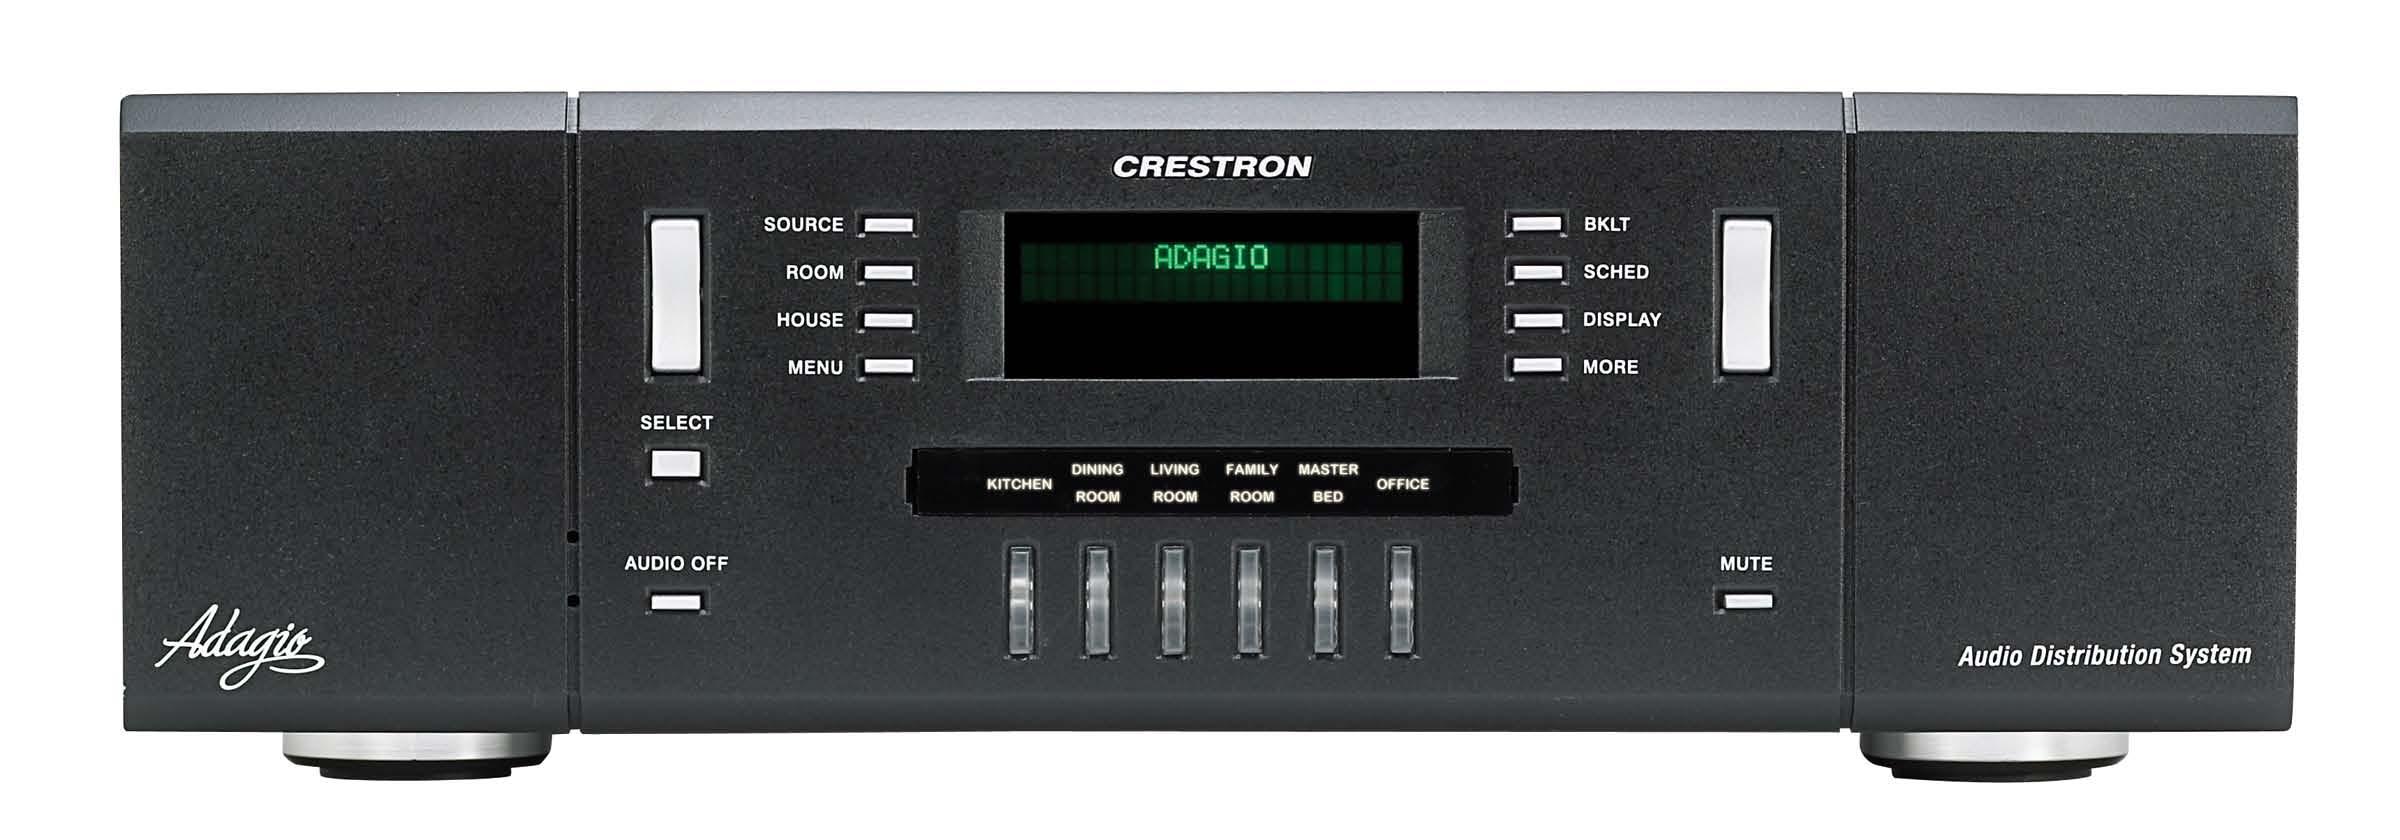 Echipamente de distributie audio-video CRESTRON - Poza 3